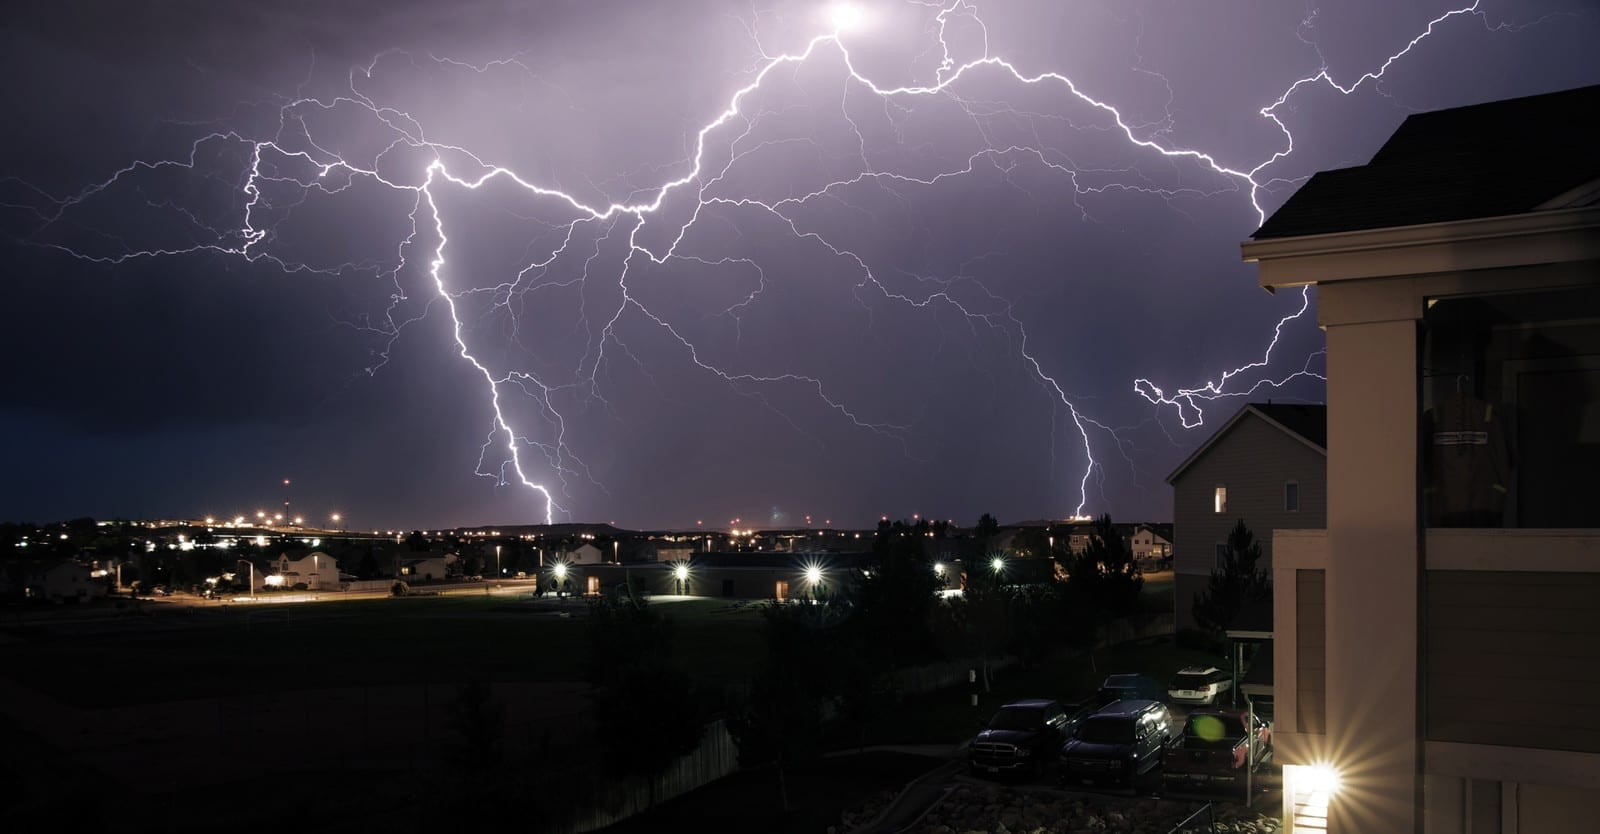 Longmont, CO Storm and Hail Damage